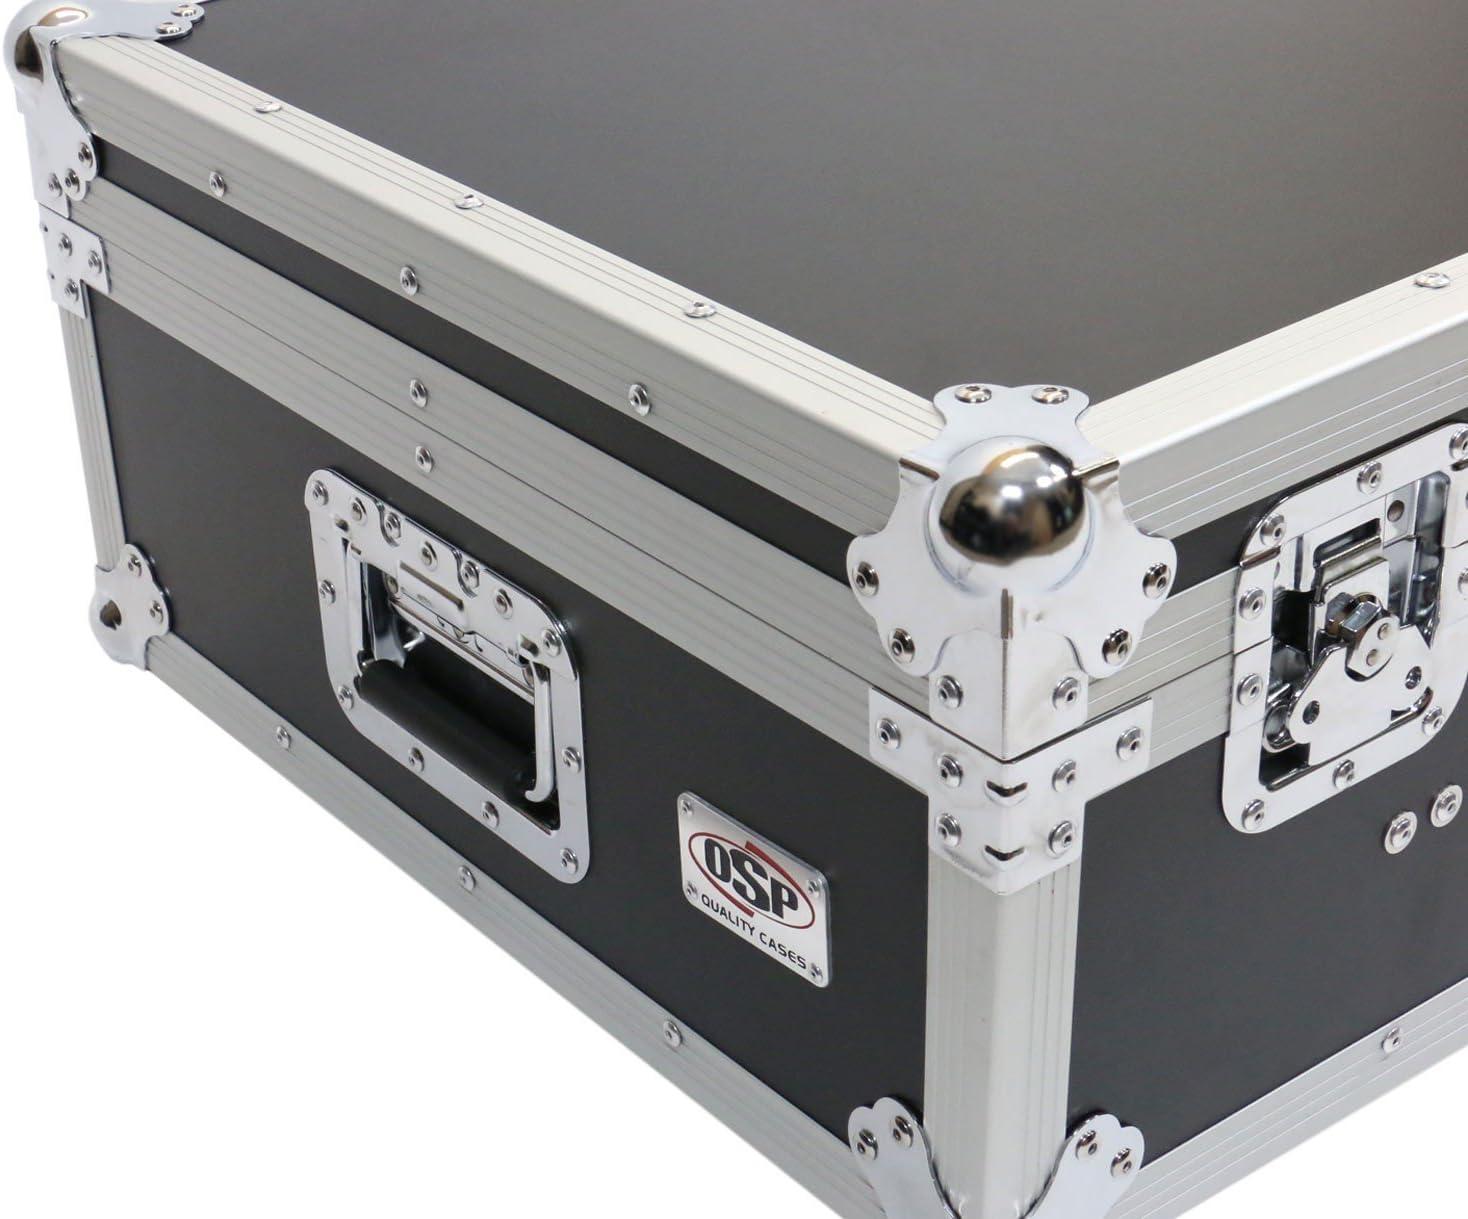 PVC Coated Buyers Products 3004713 Toolbox Door Lanyard